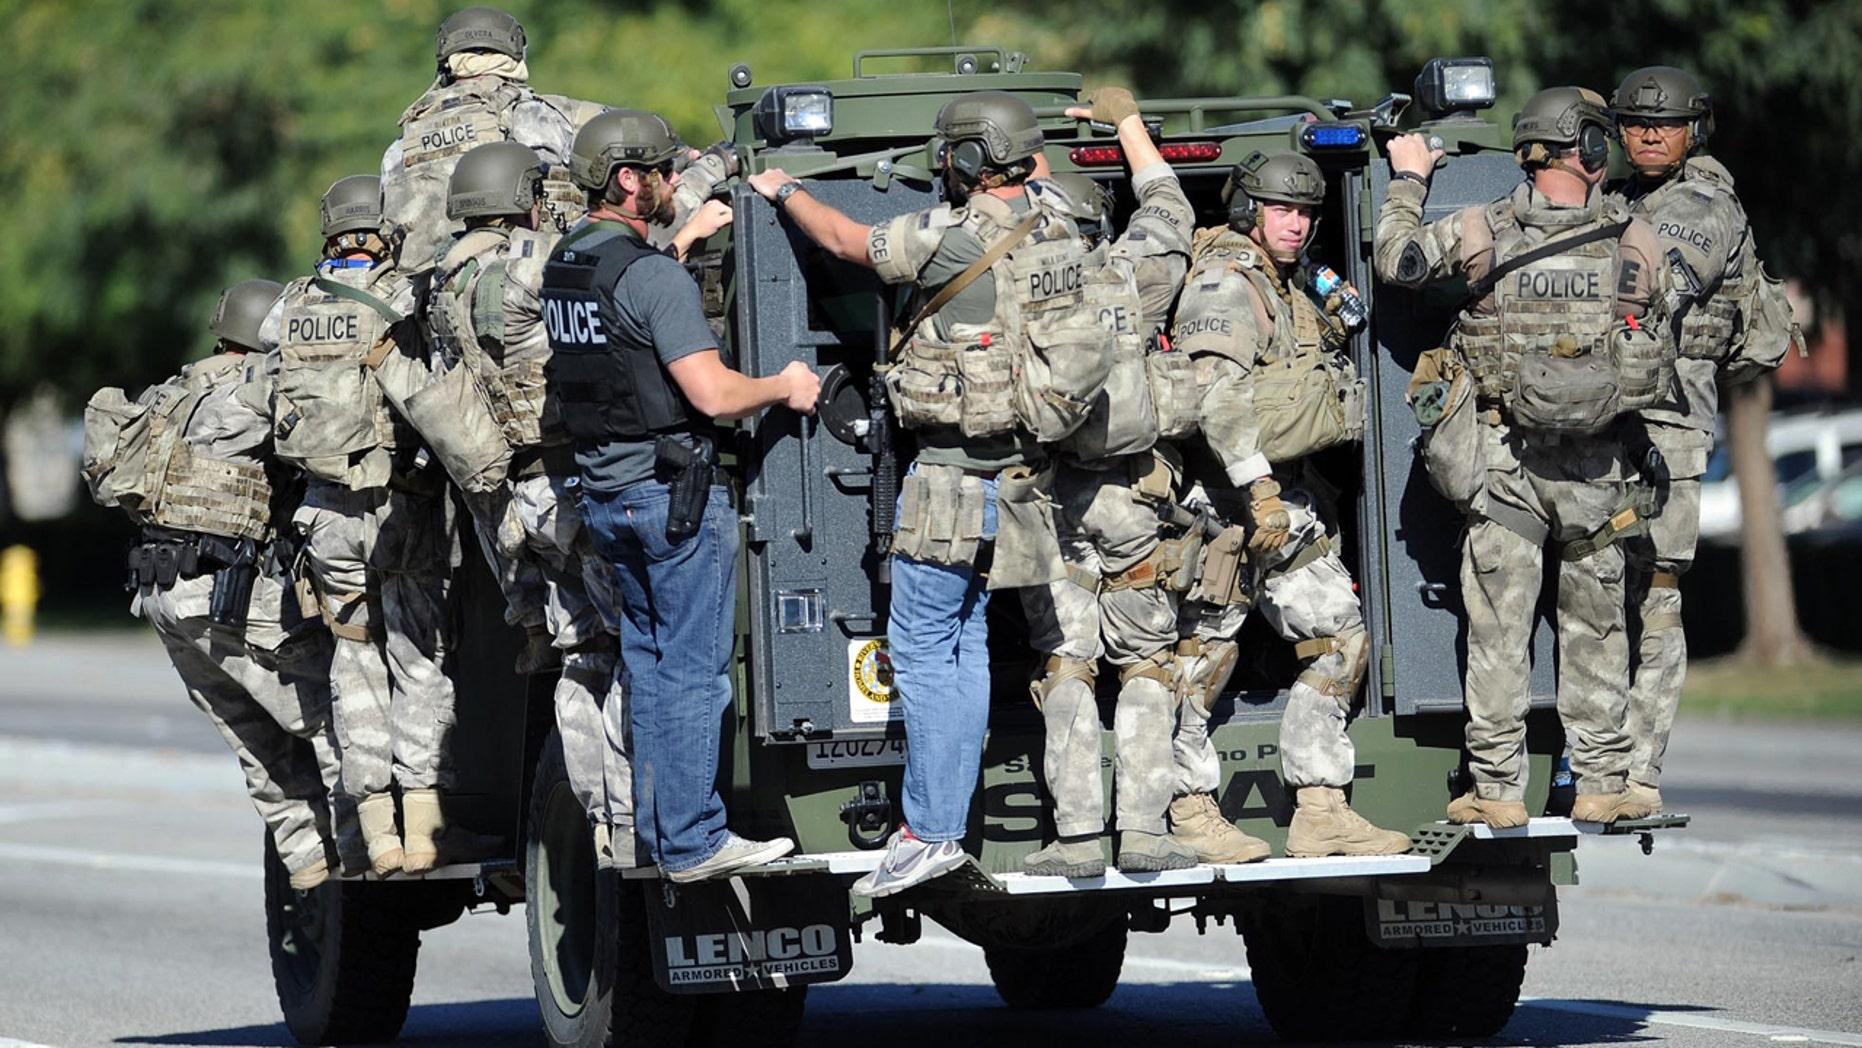 Dec. 2, 2015: An armored vehicle carries police officers near the scene of multiple shootings in San Bernardino, Calif.